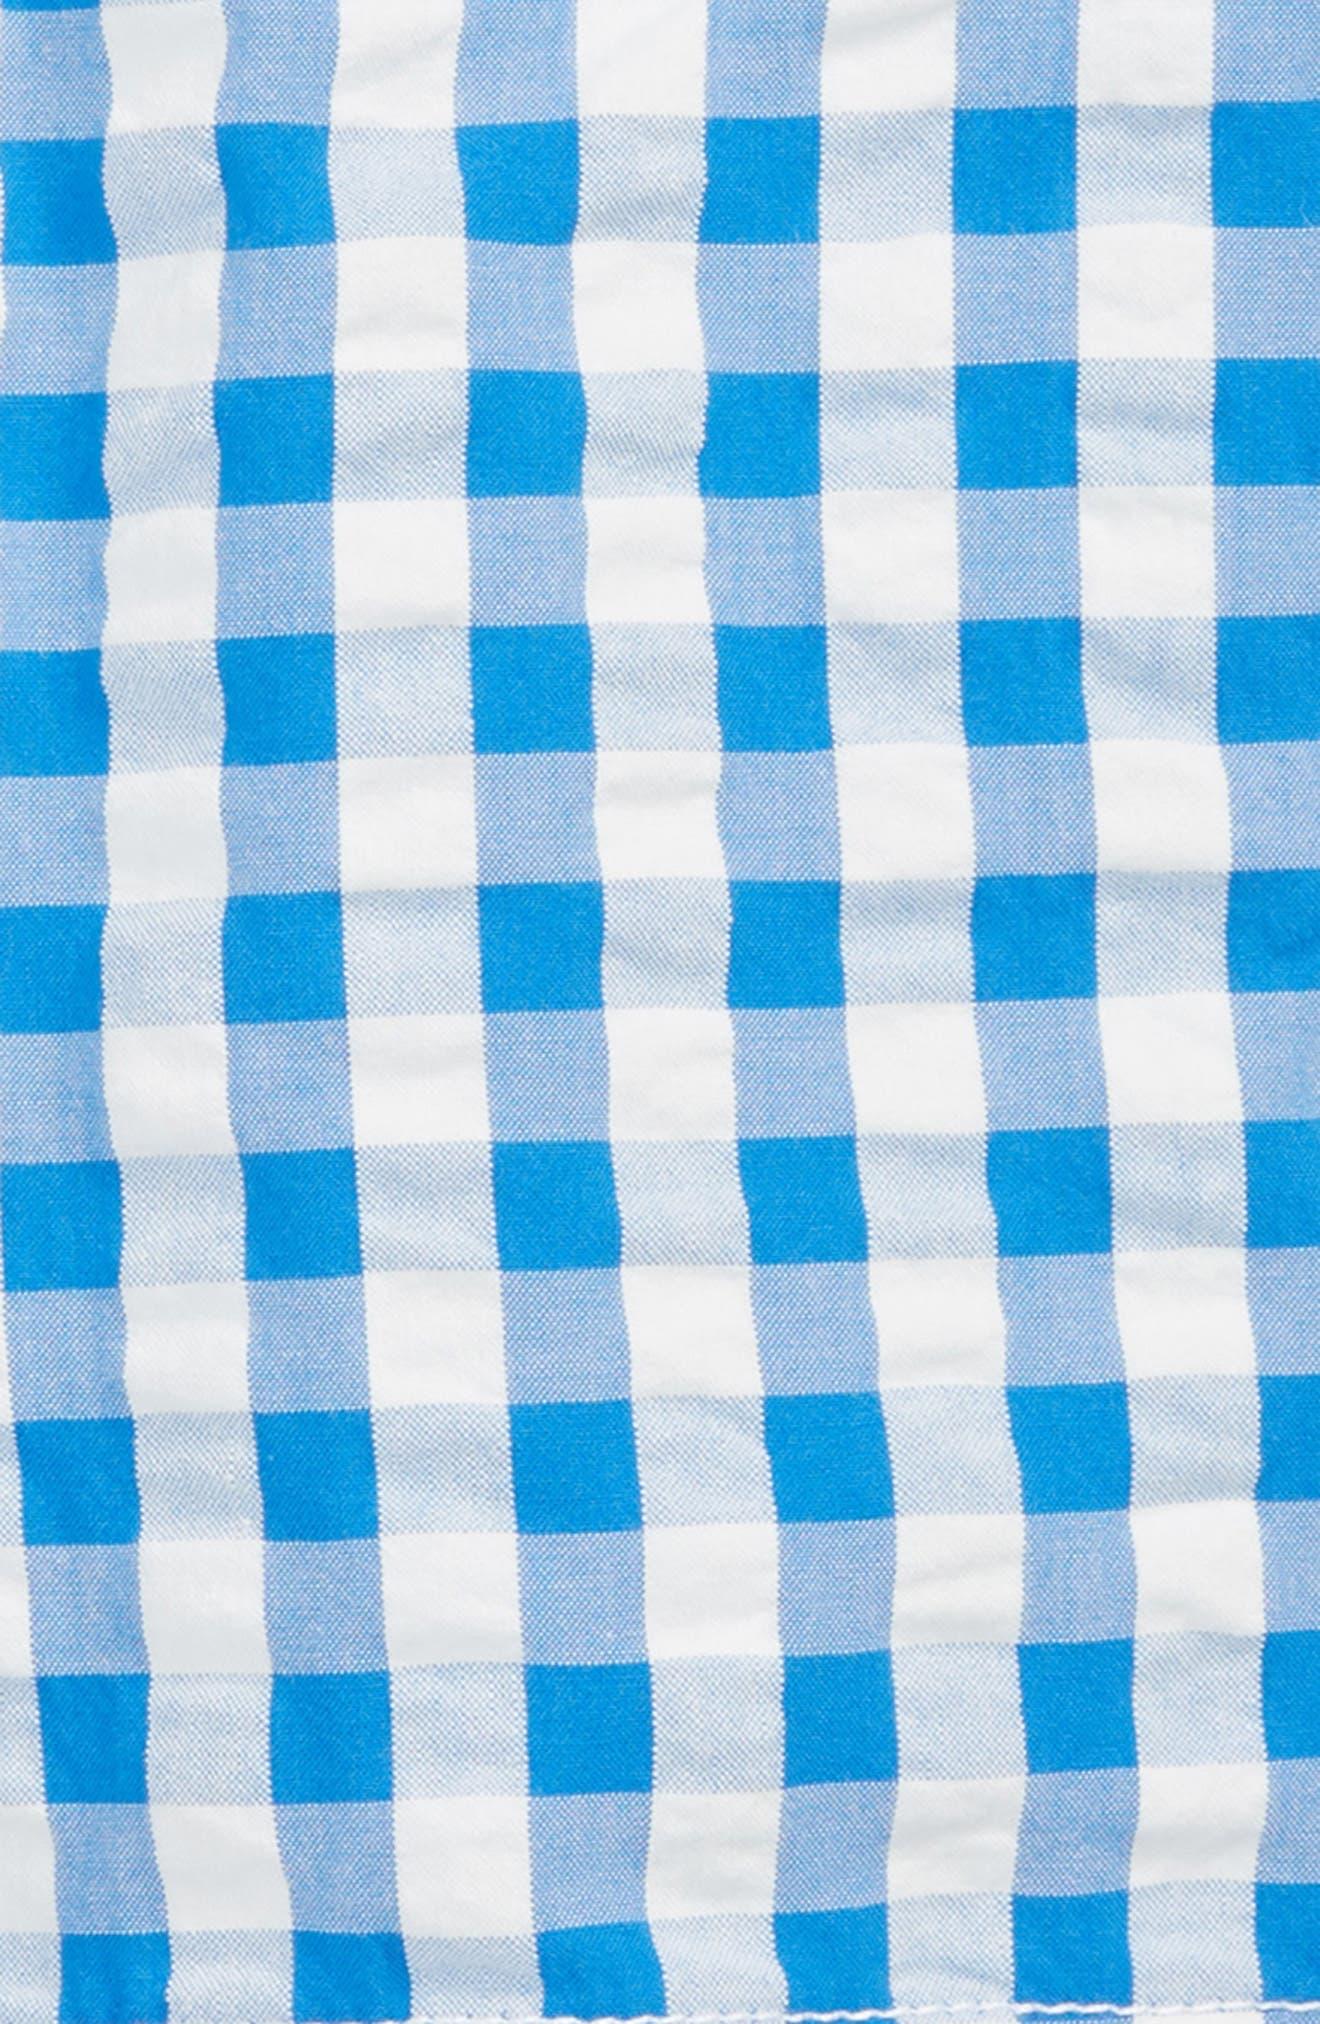 Bright Adventure Shorts,                             Alternate thumbnail 2, color,                             Skipper Blue Gingham Blu